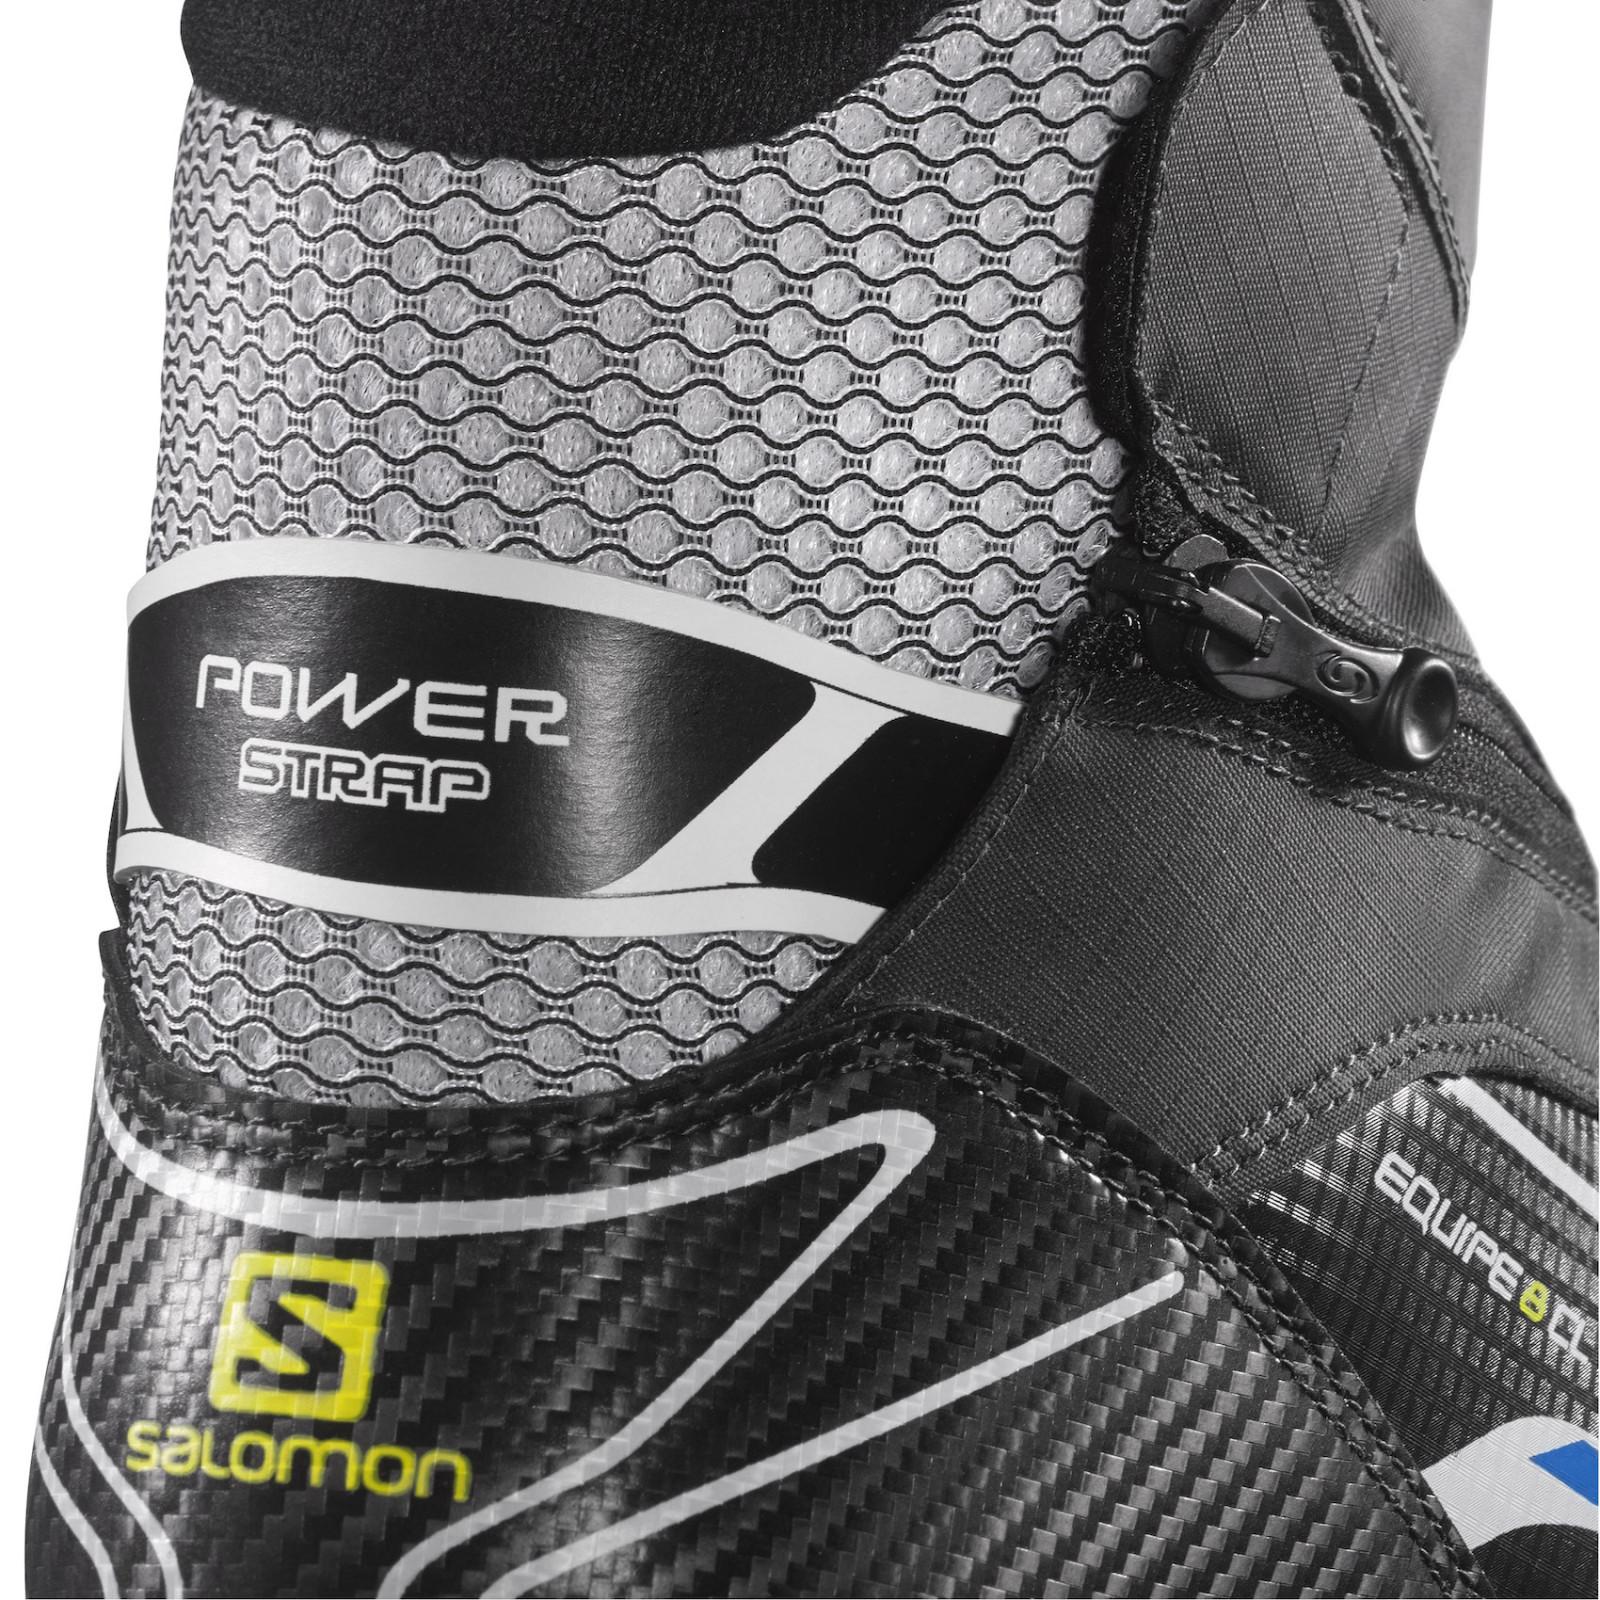 651f452d144 běžecké boty salomon L36815900 EQUIPE 8 CLASSIC · běžecké boty salomon  L36815900 EQUIPE 8 CLASSIC